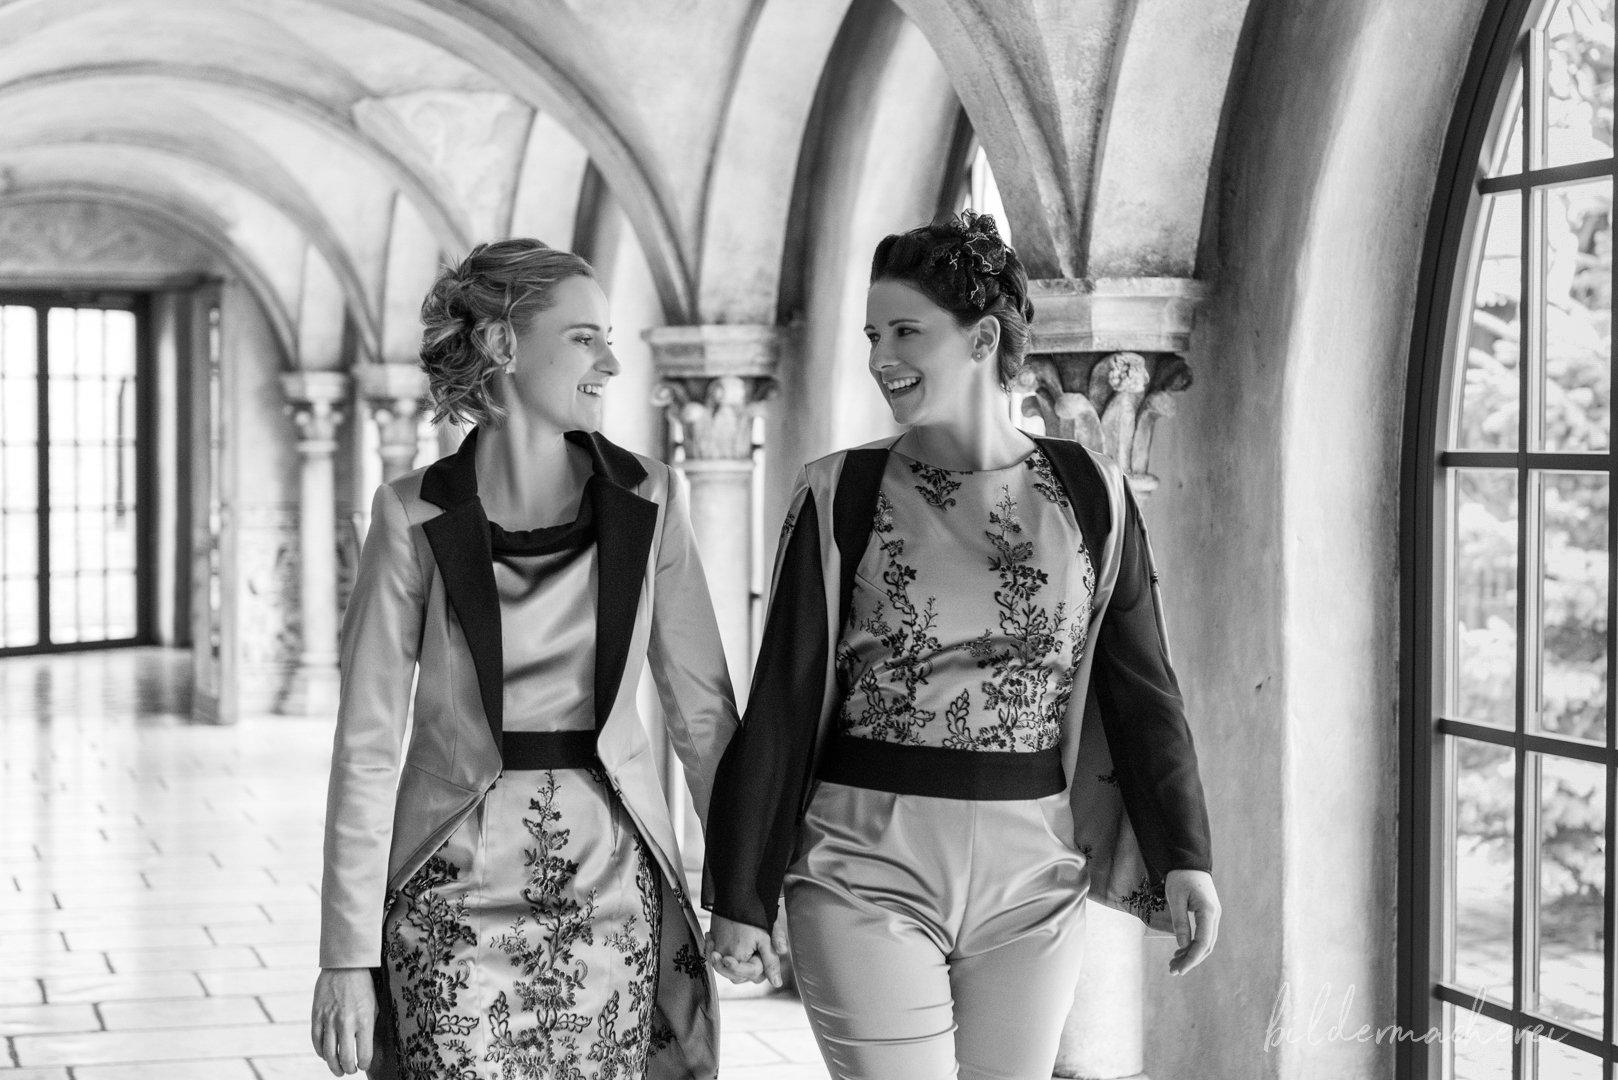 Linda & Sandra © Bildmacherei Laura Junele-Bellert